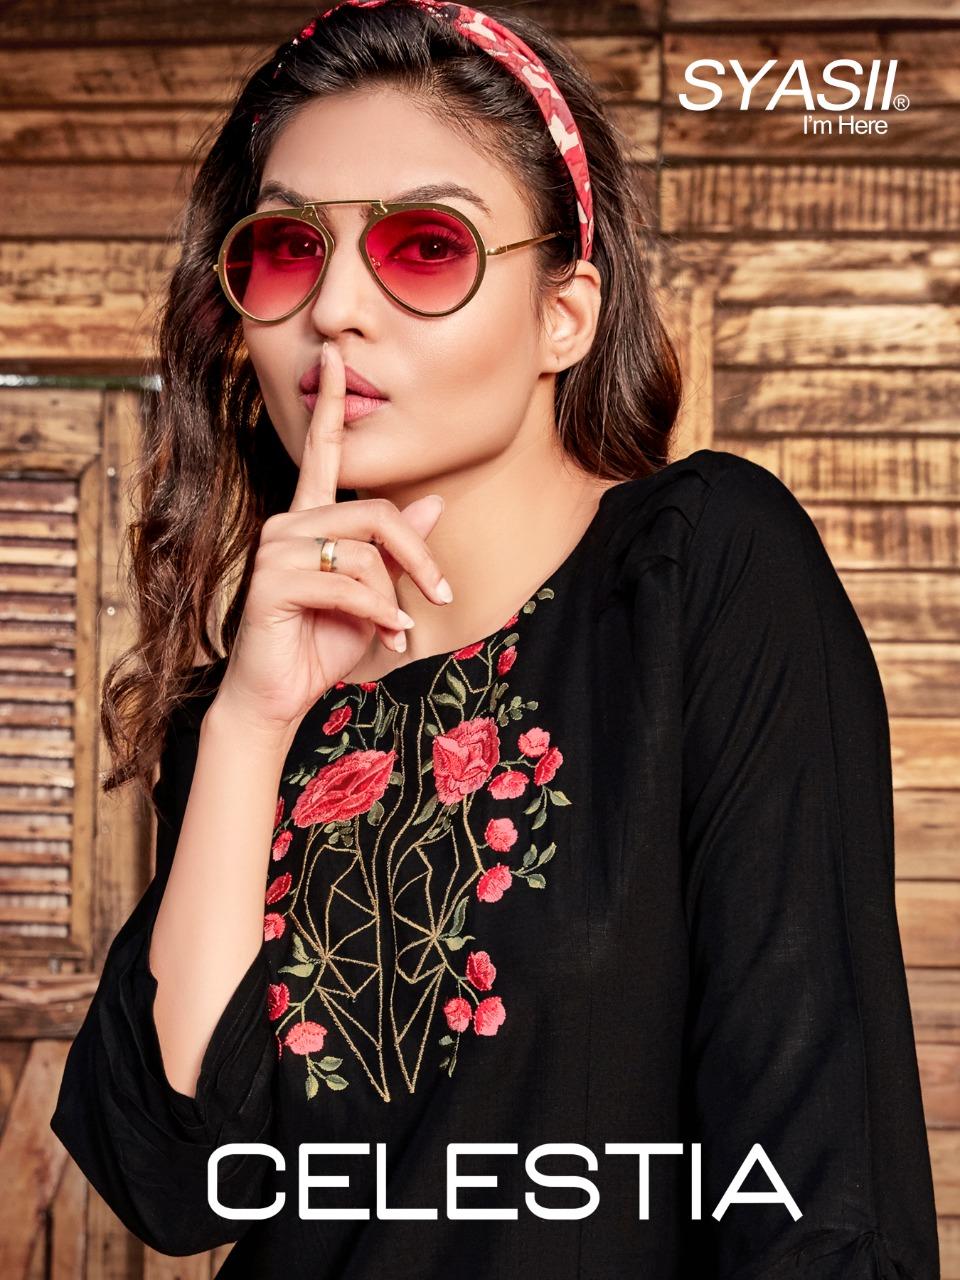 Syasii Designer Launch Celestia Rayon Slub Short Top For Girls Collections